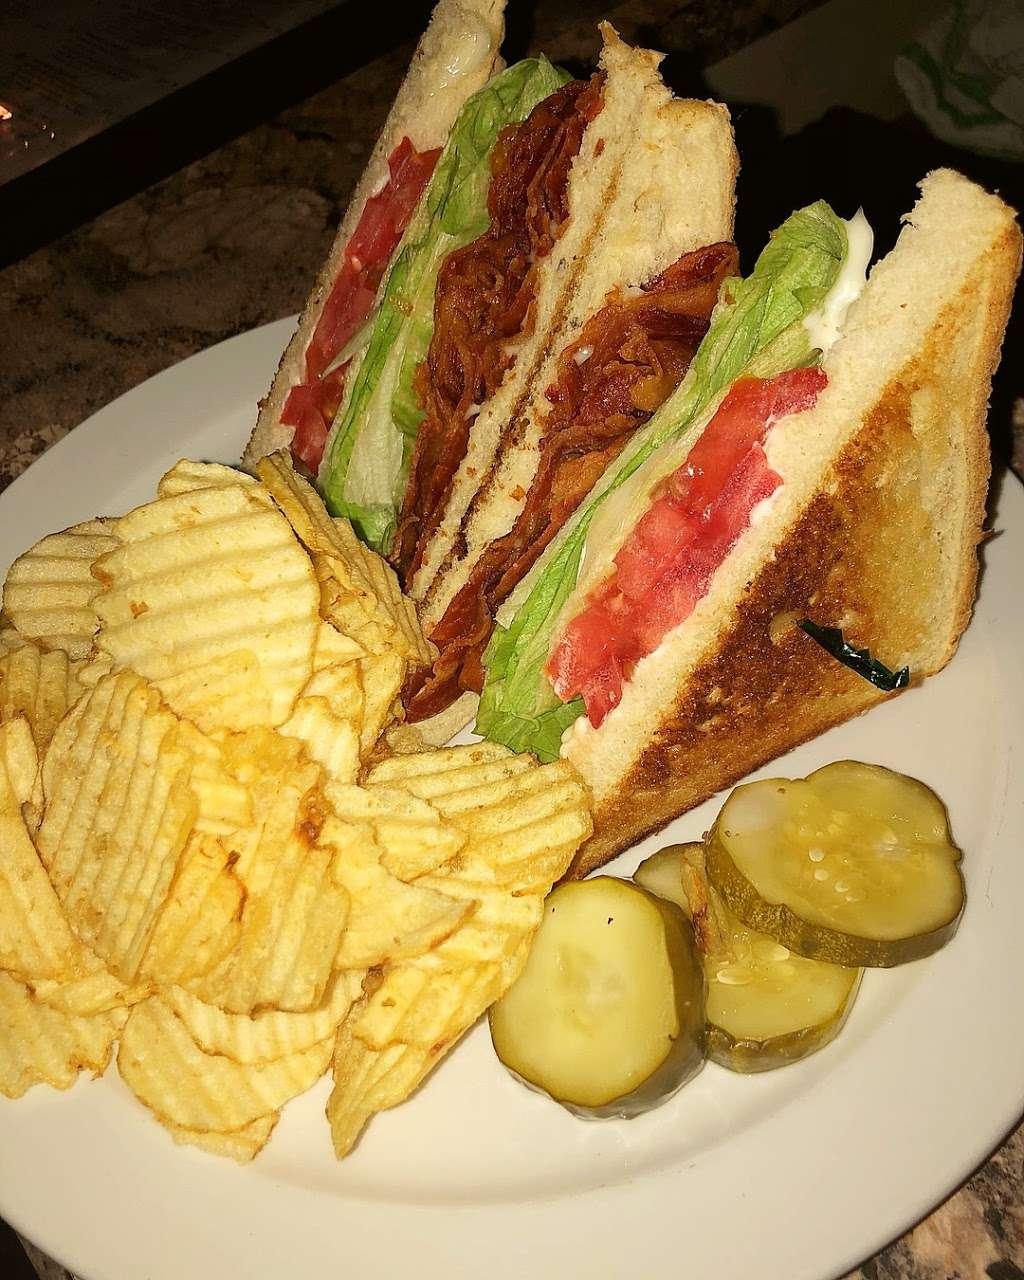 LOCAL Bar & Kitchen - restaurant  | Photo 6 of 10 | Address: 377 W Broad St, Gibbstown, NJ 08027, USA | Phone: (856) 423-2233